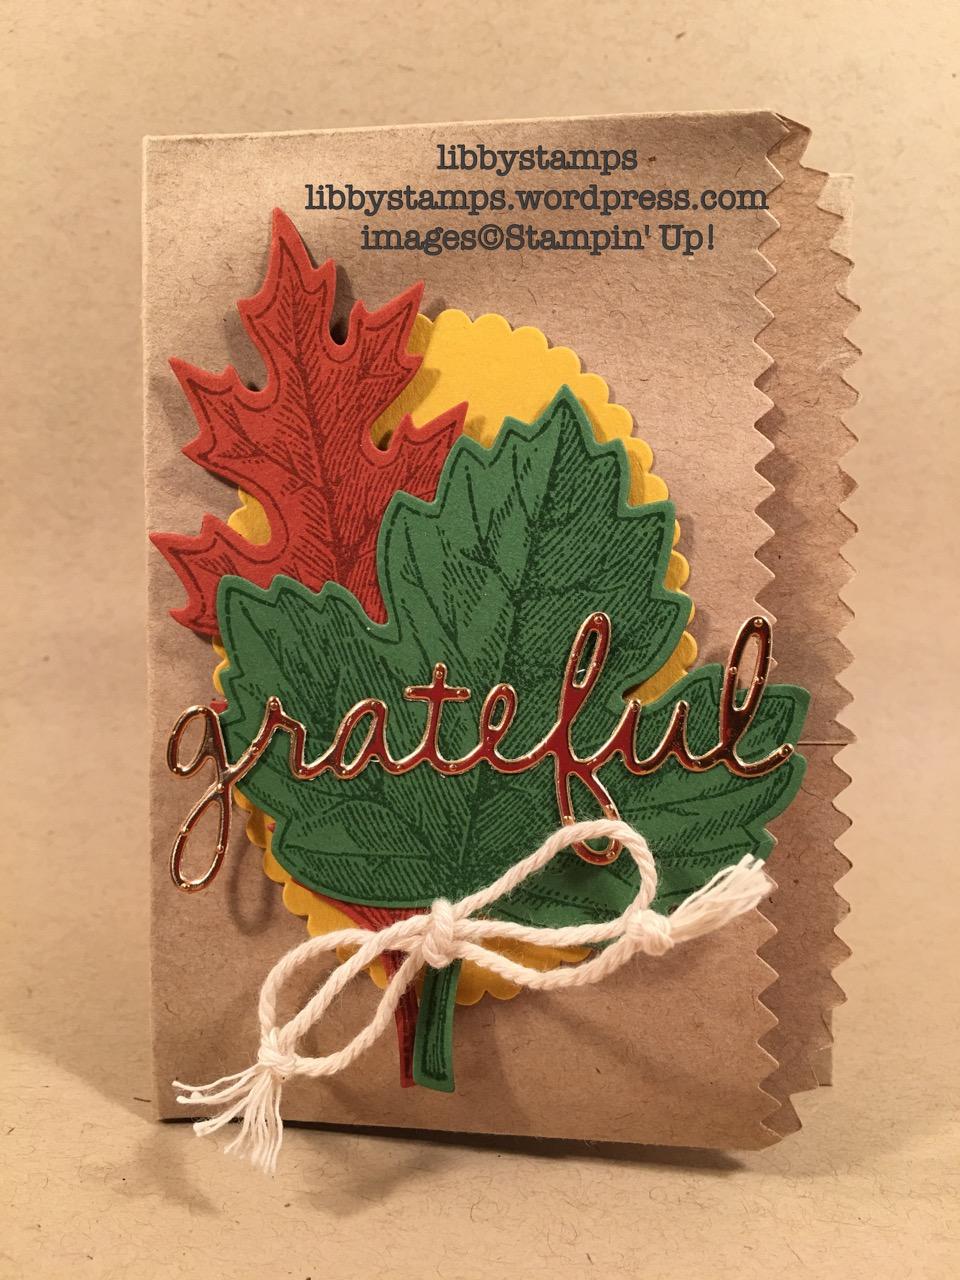 libbystamps, stampin up, Seasonal Frame Thinlits, Copper Foil, Kraft Tag A Bag Gift Bags, Vintage Leaves, Leaflets Framelits, Season Frame Thinlits